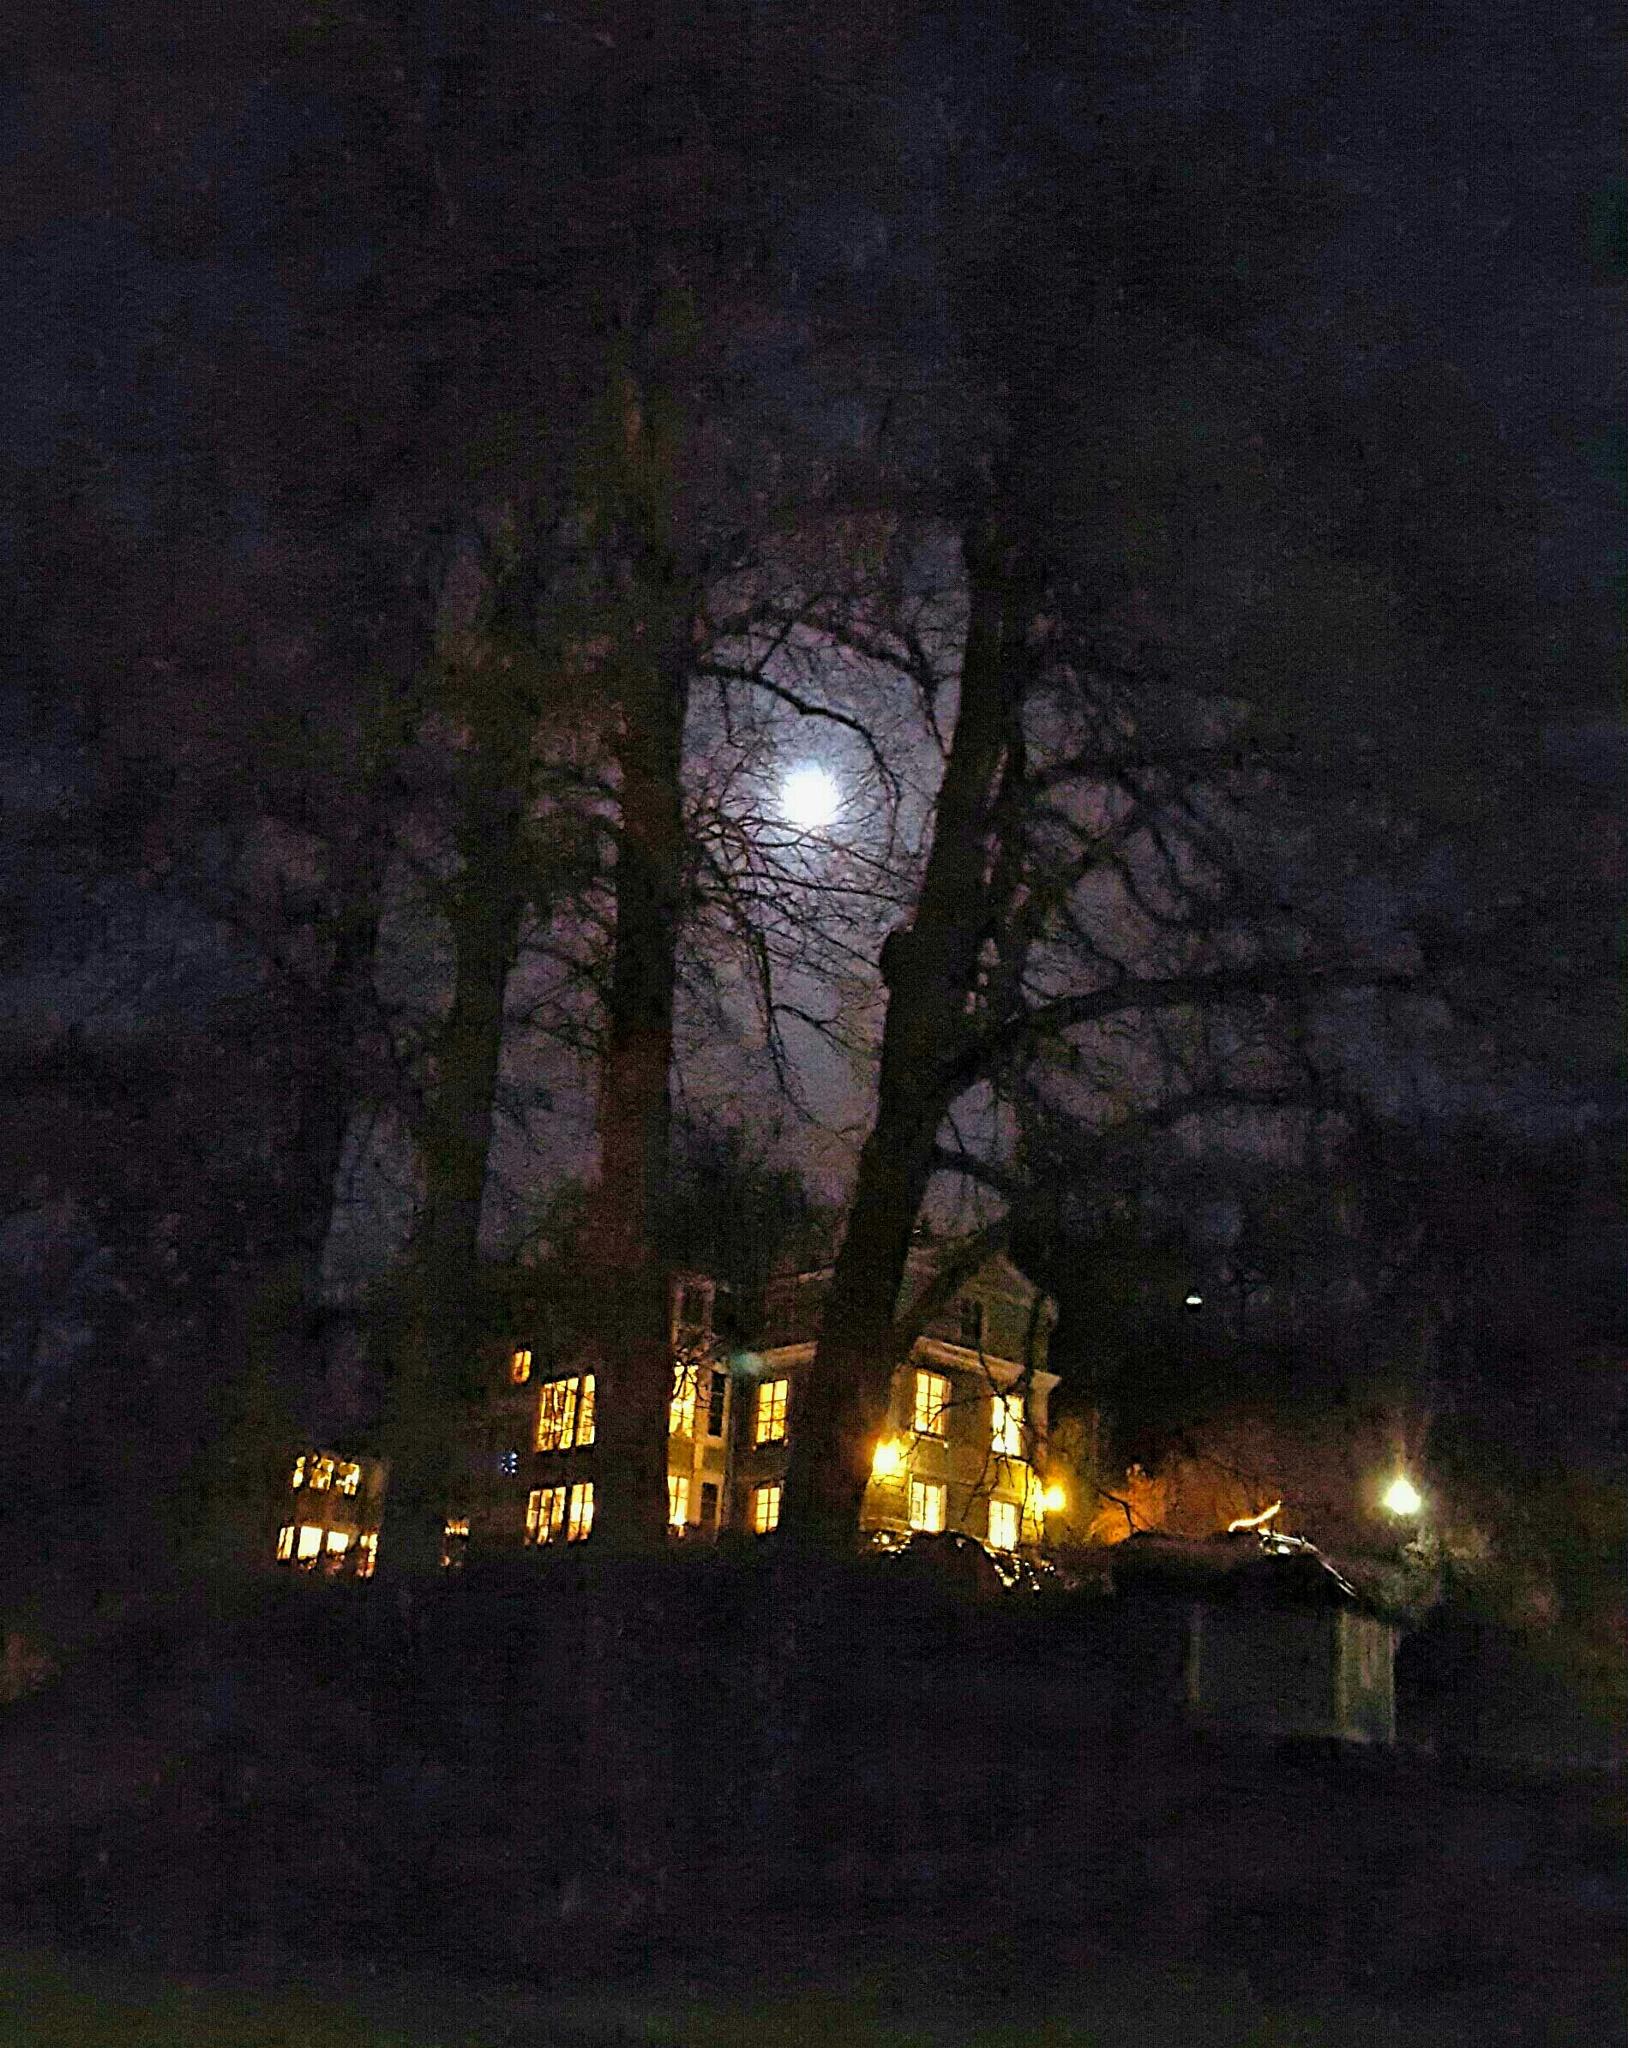 Moonlight  by Susanne Brännström